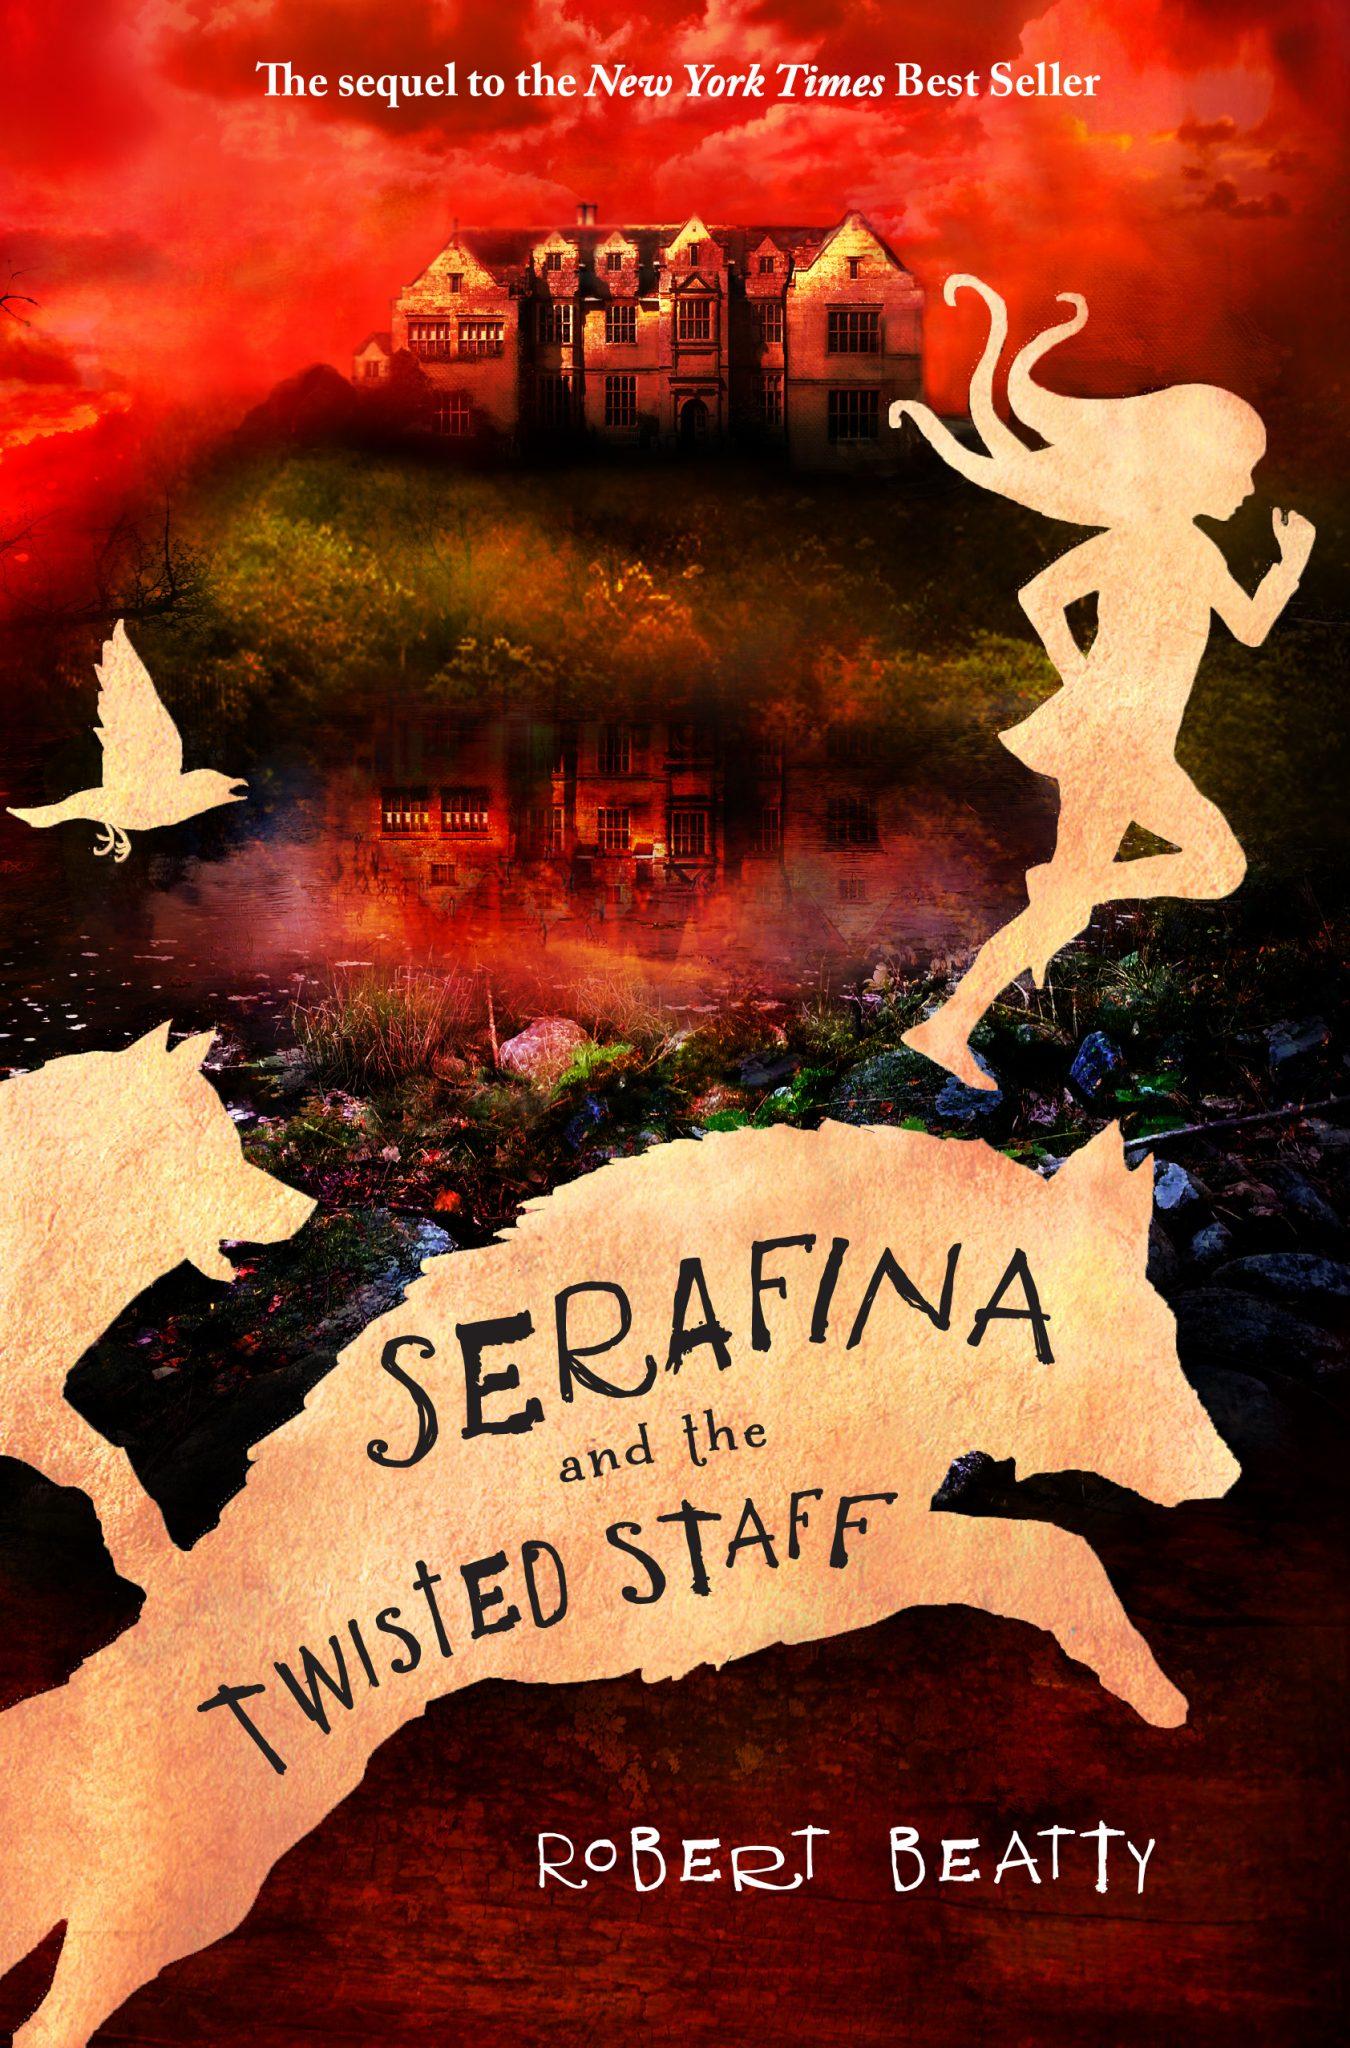 SerafinaTwistedStaff